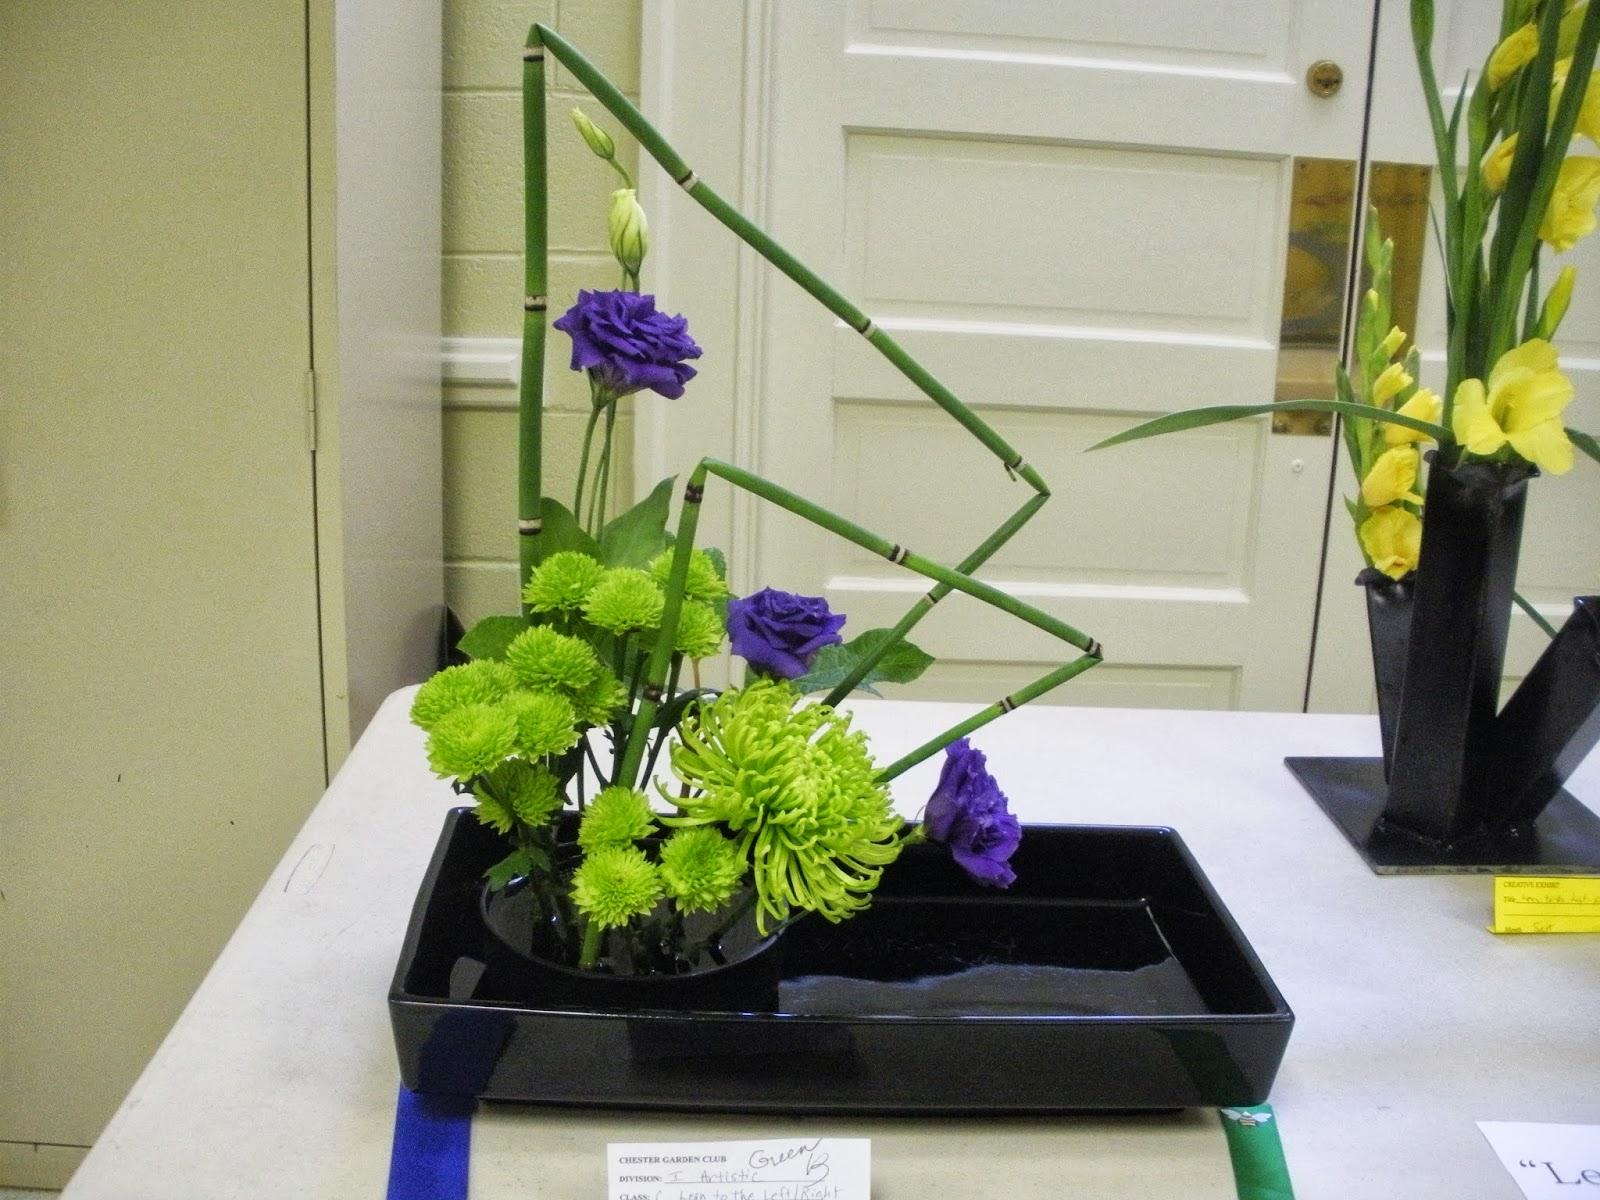 New Garden Club Journal Angular and Assemblage Designs